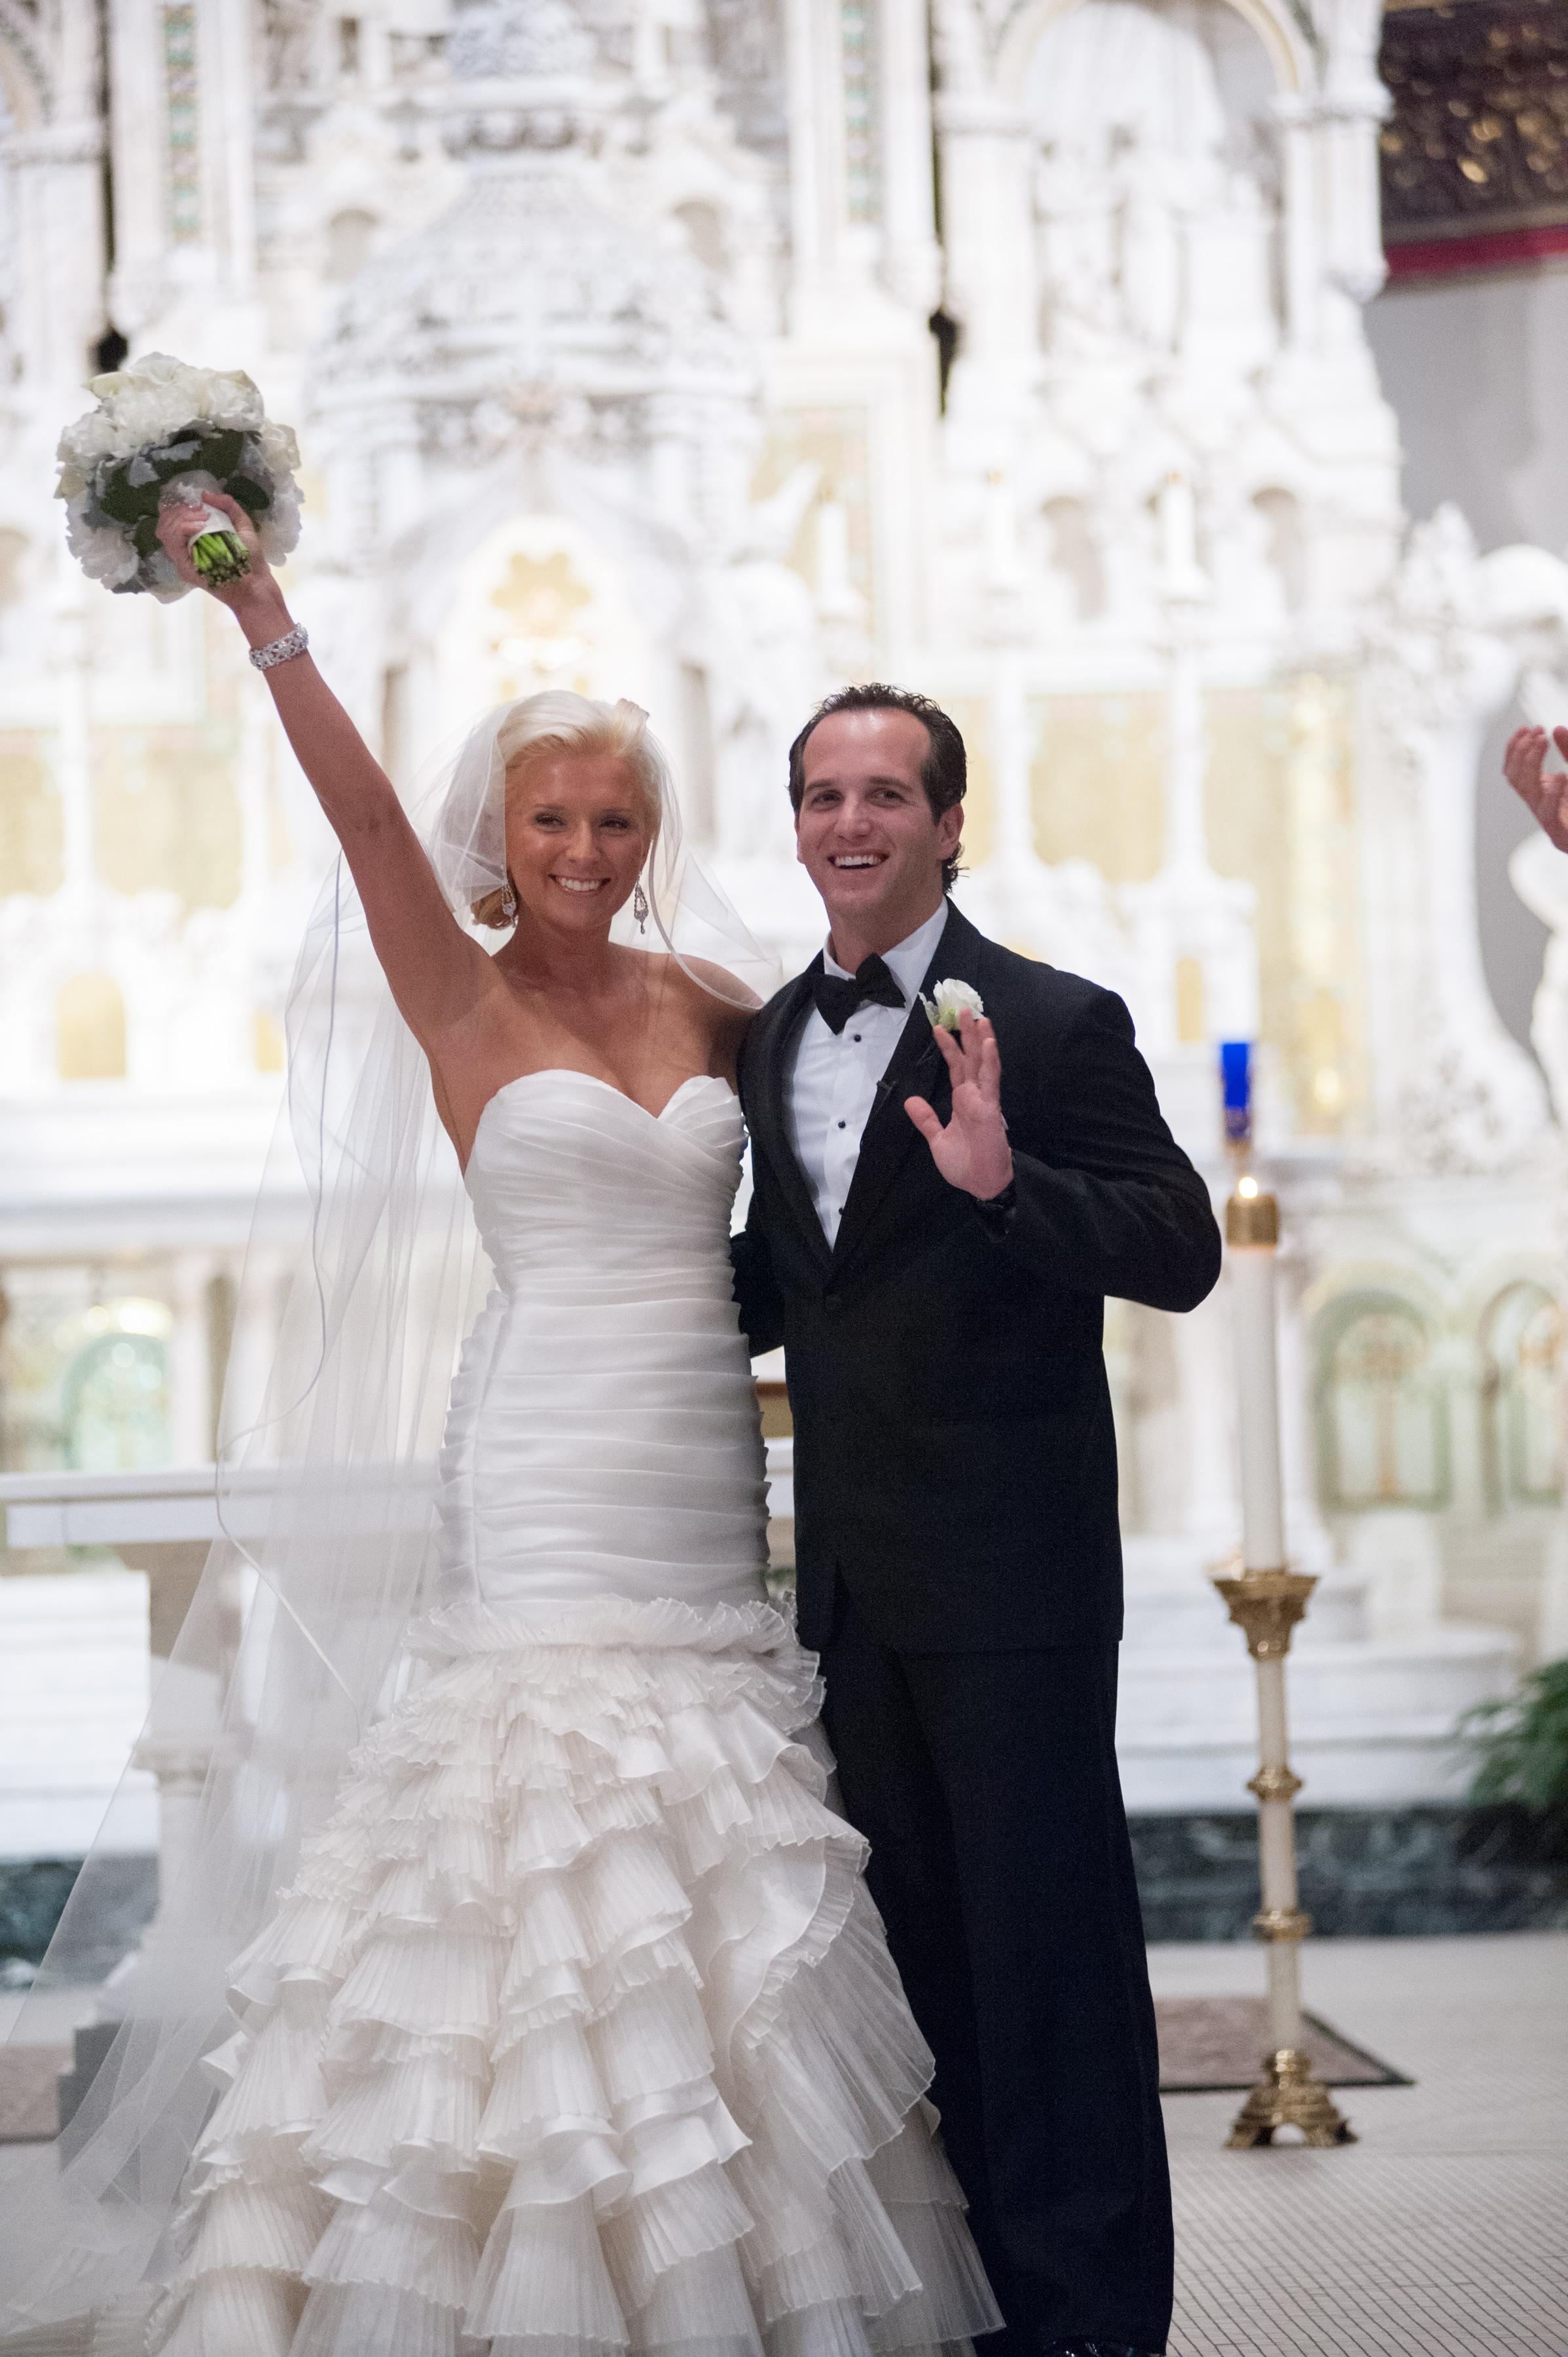 Husband And Wife 171 Jlm Weddings